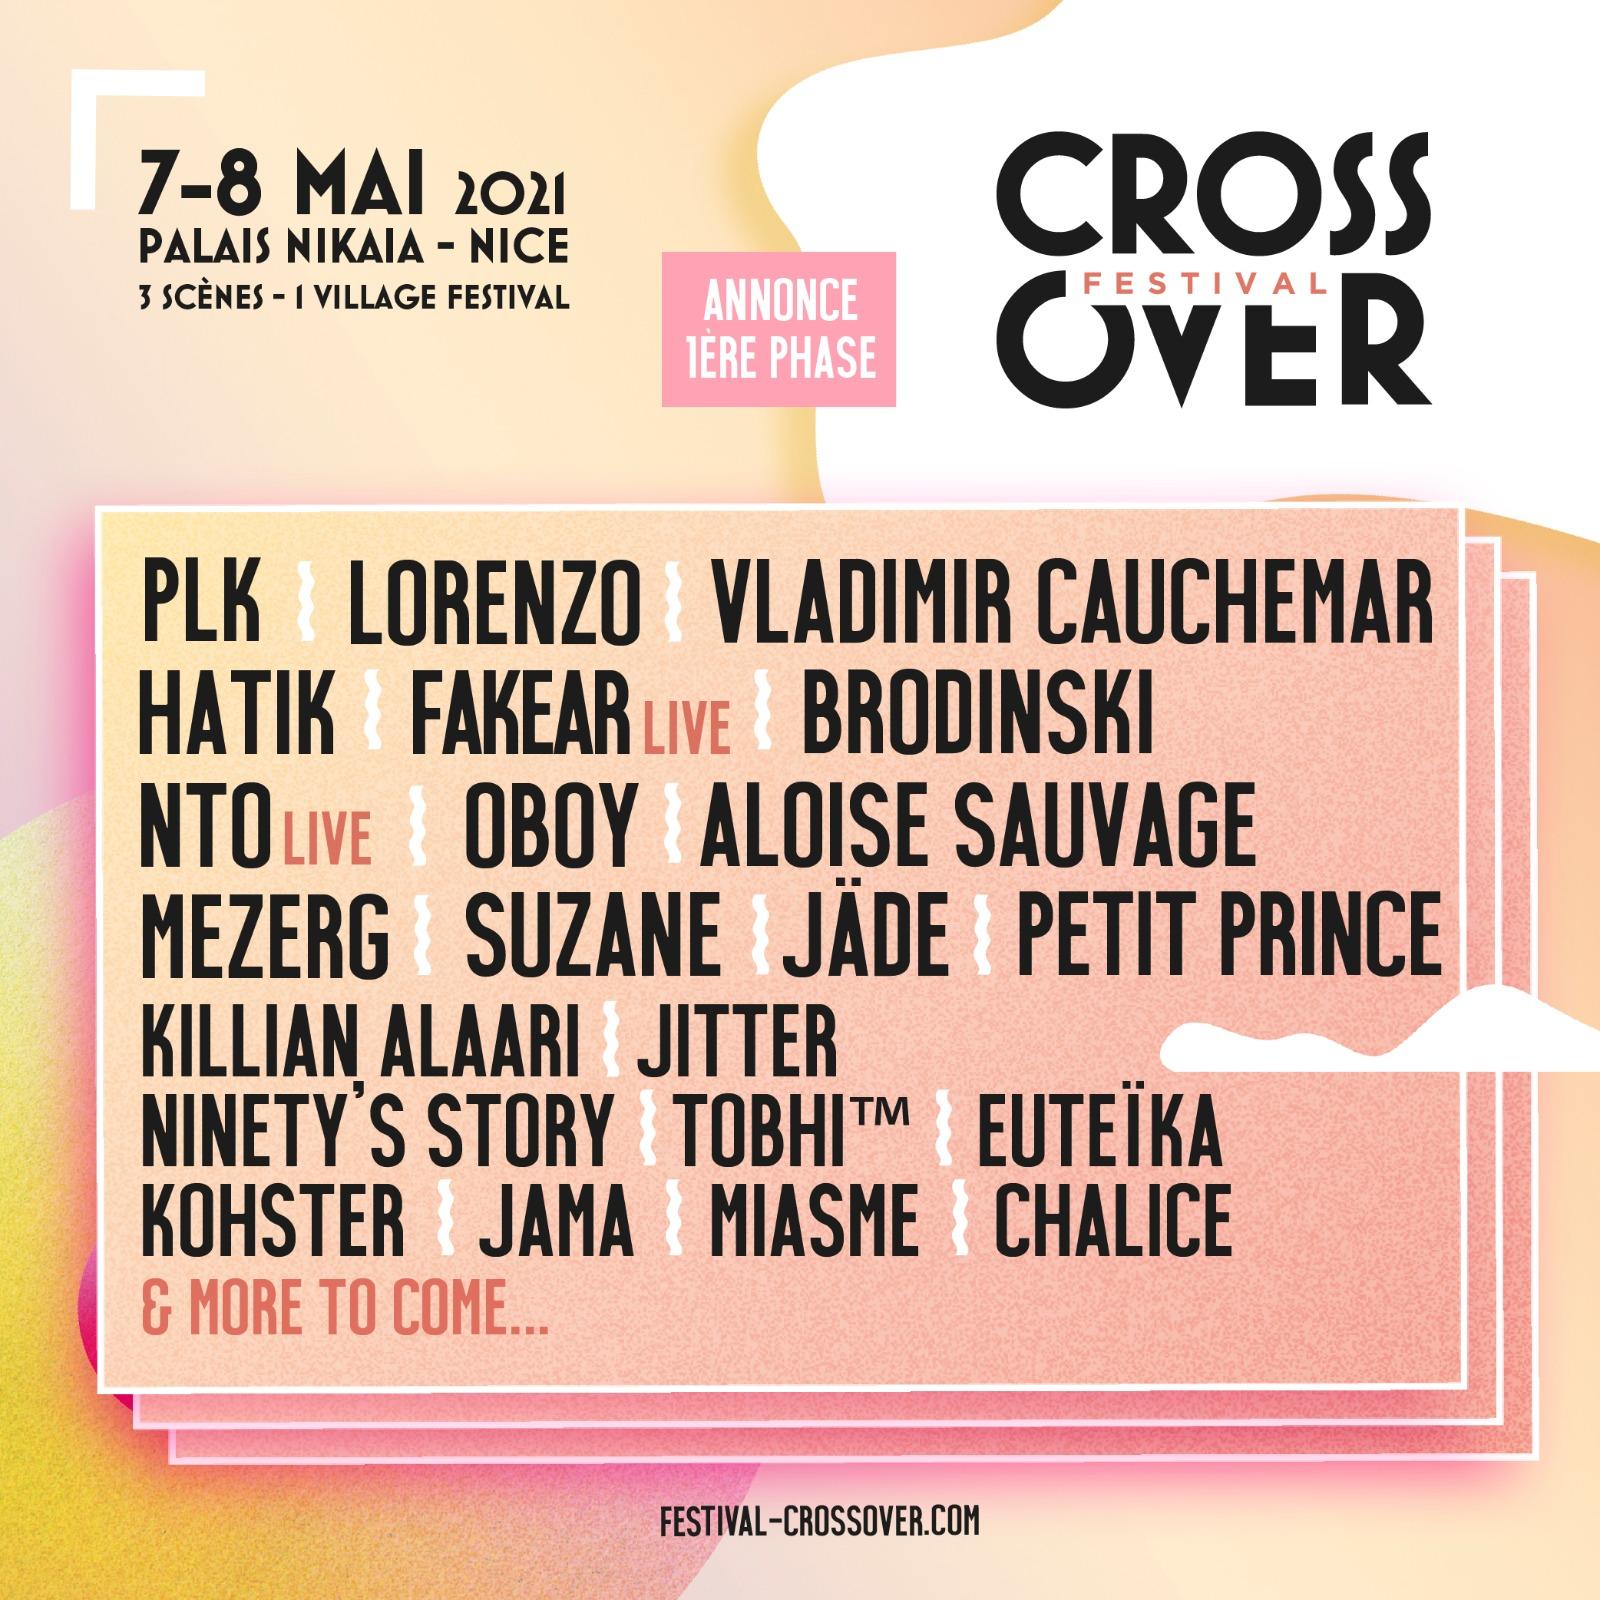 Festival Crossover · 7 & 8 mai 2021 · Nice